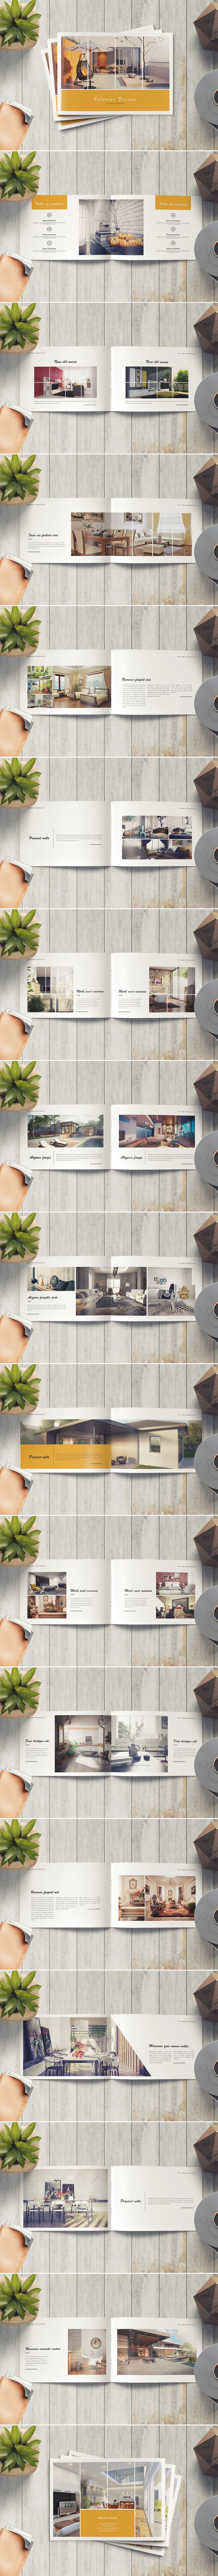 Minimal Product Catalog / Brochure on Behance